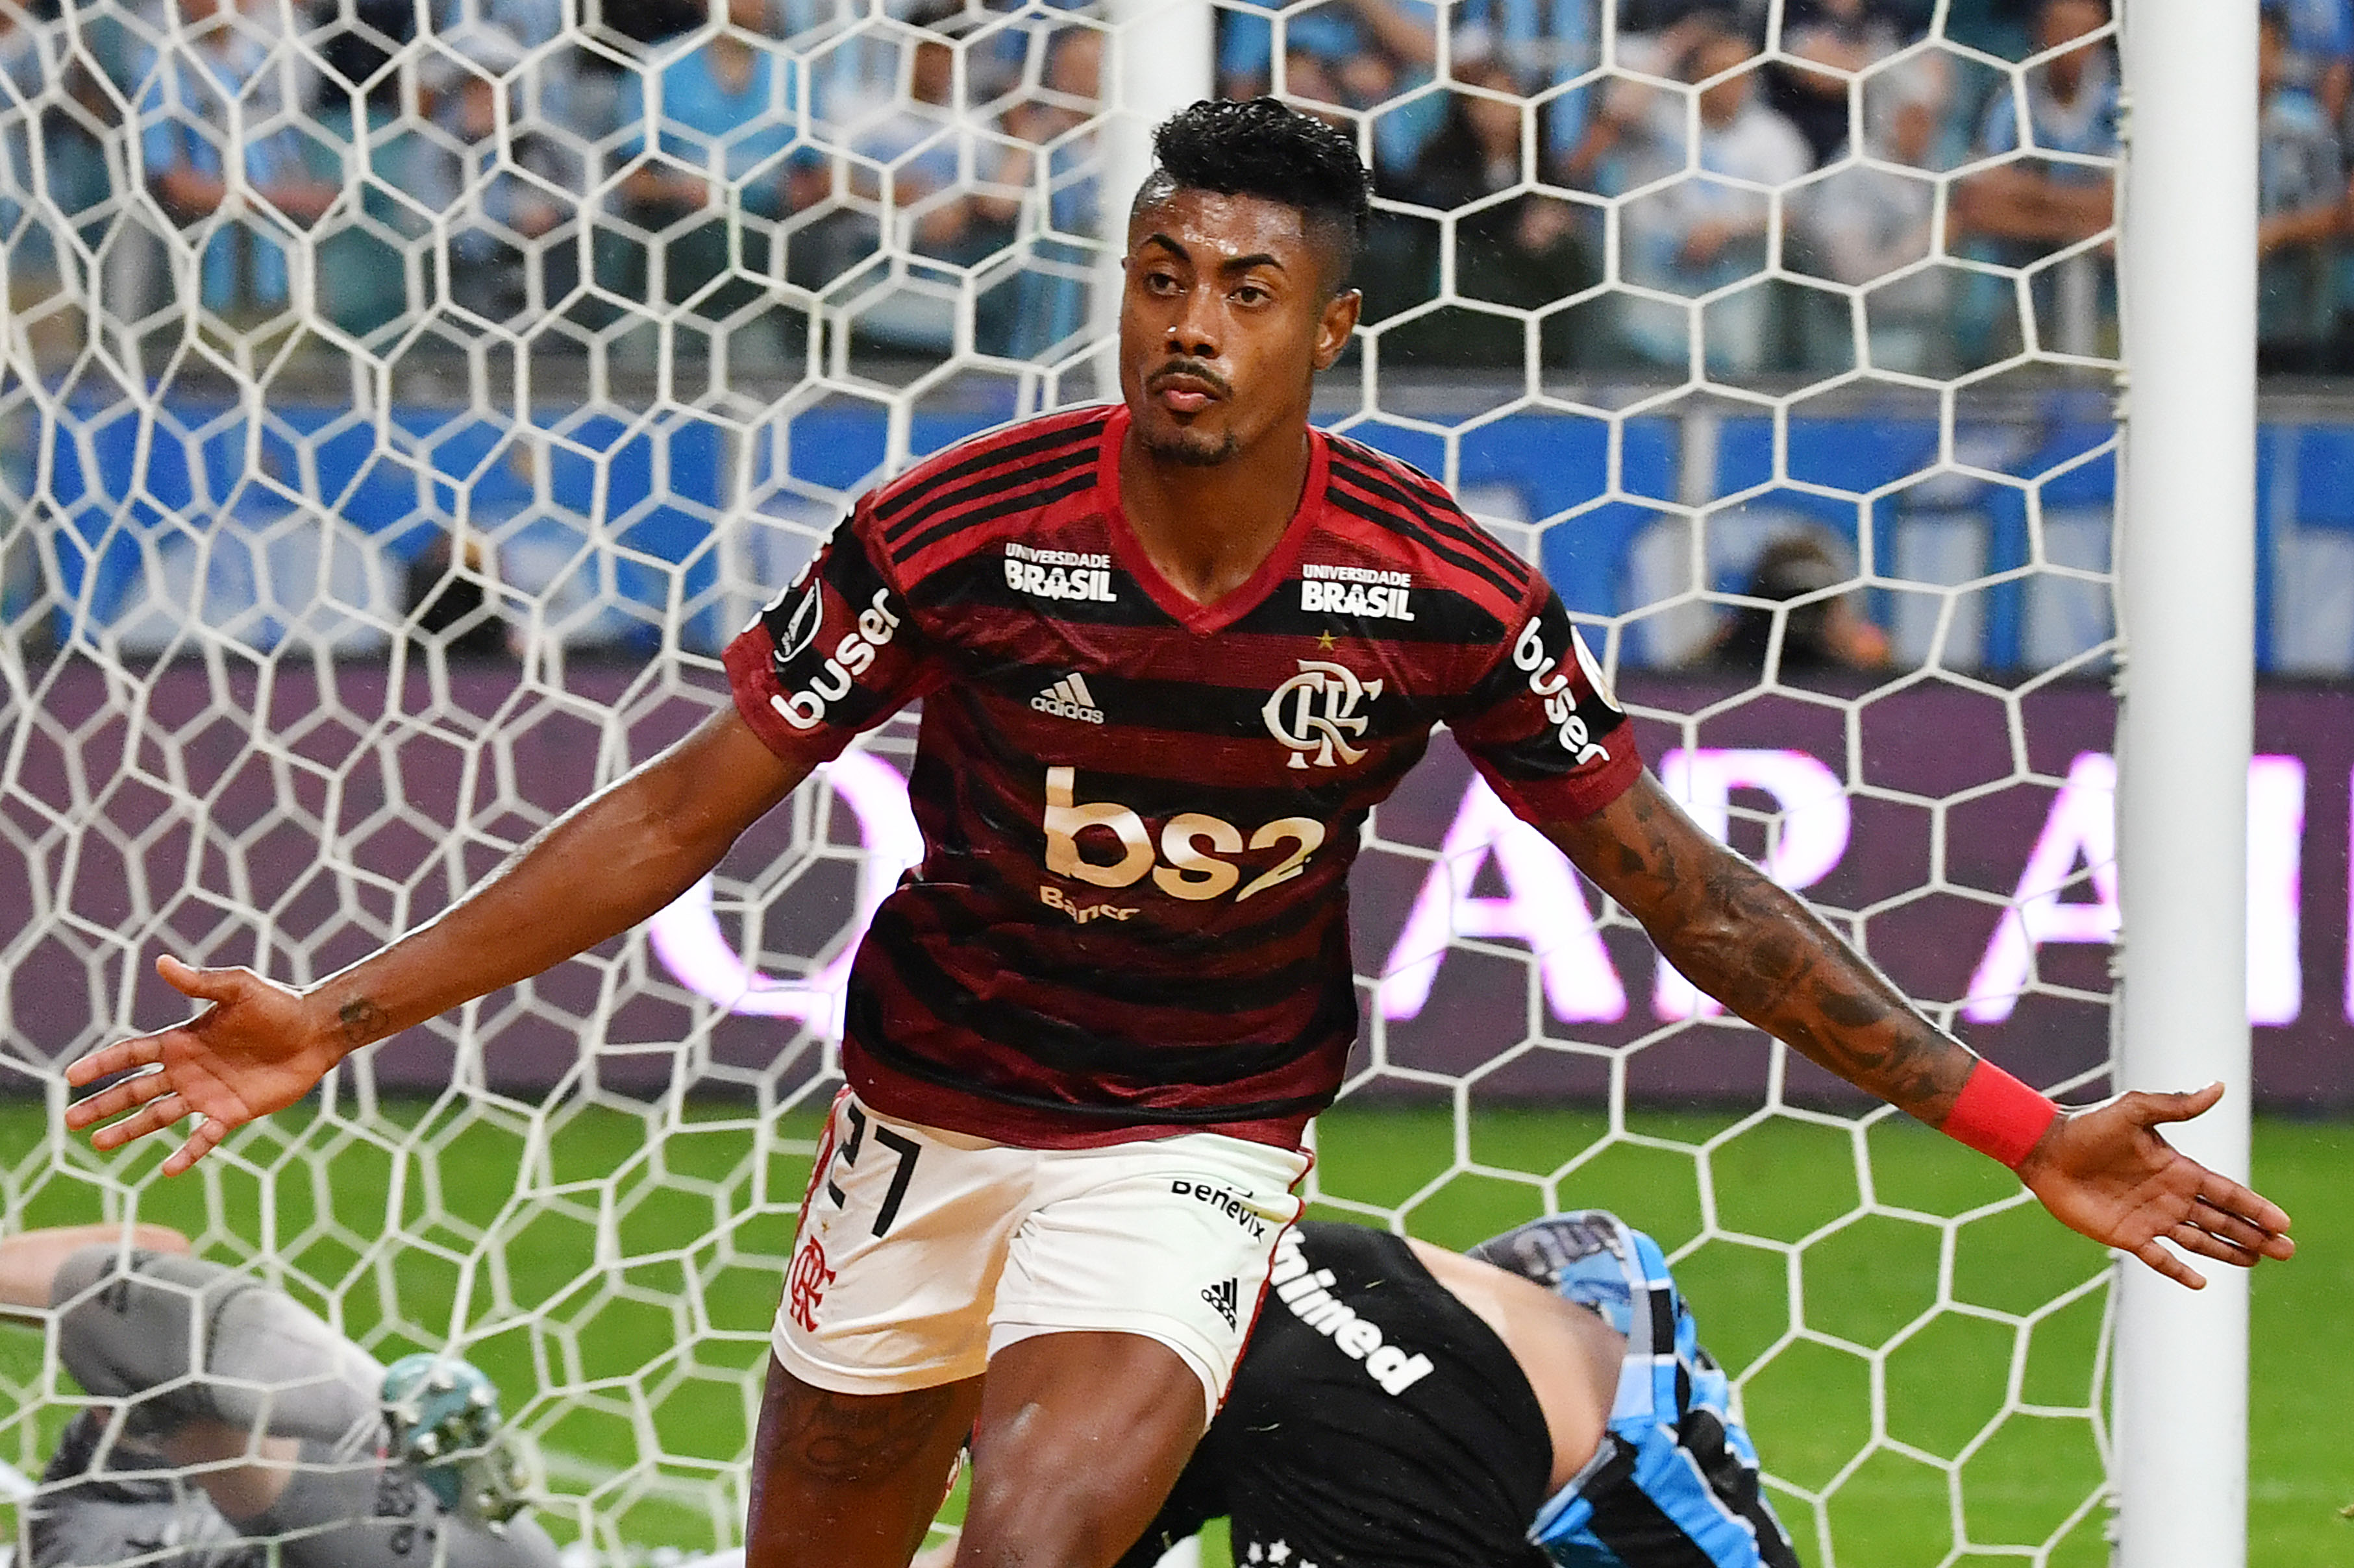 AFP Bruno Henrique Flamengo Grêmio Copa Libertadores 2019